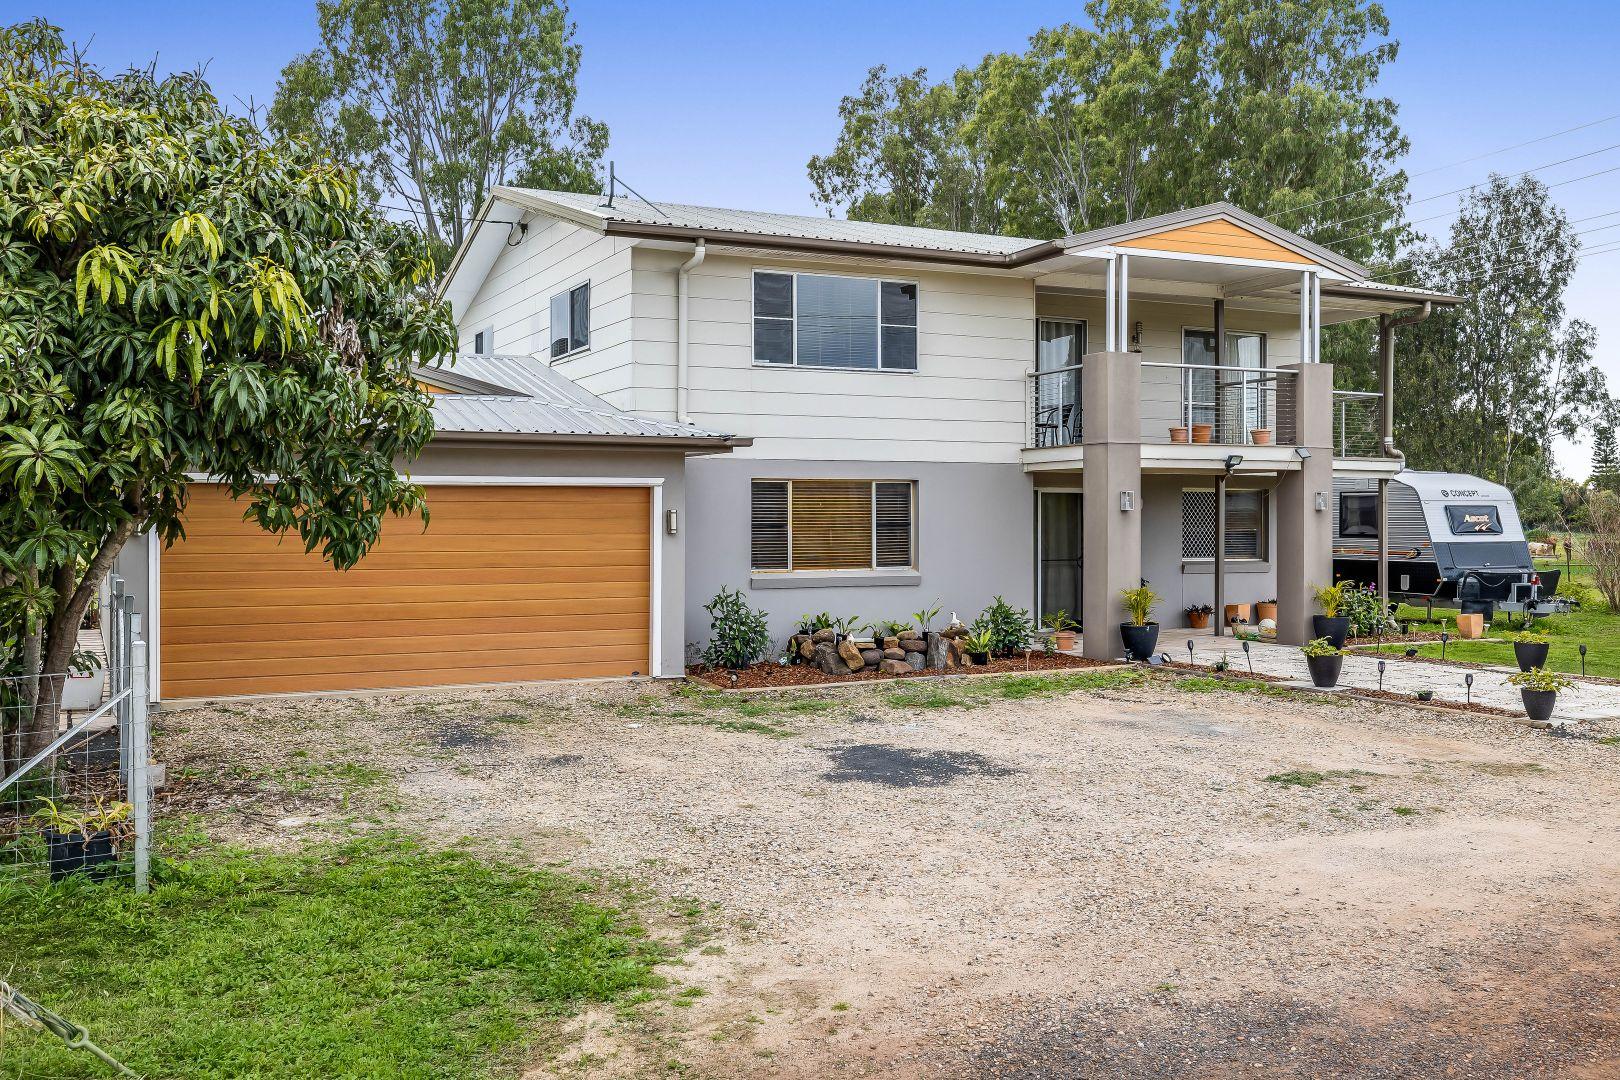 85 School Street, Helidon QLD 4344, Image 1